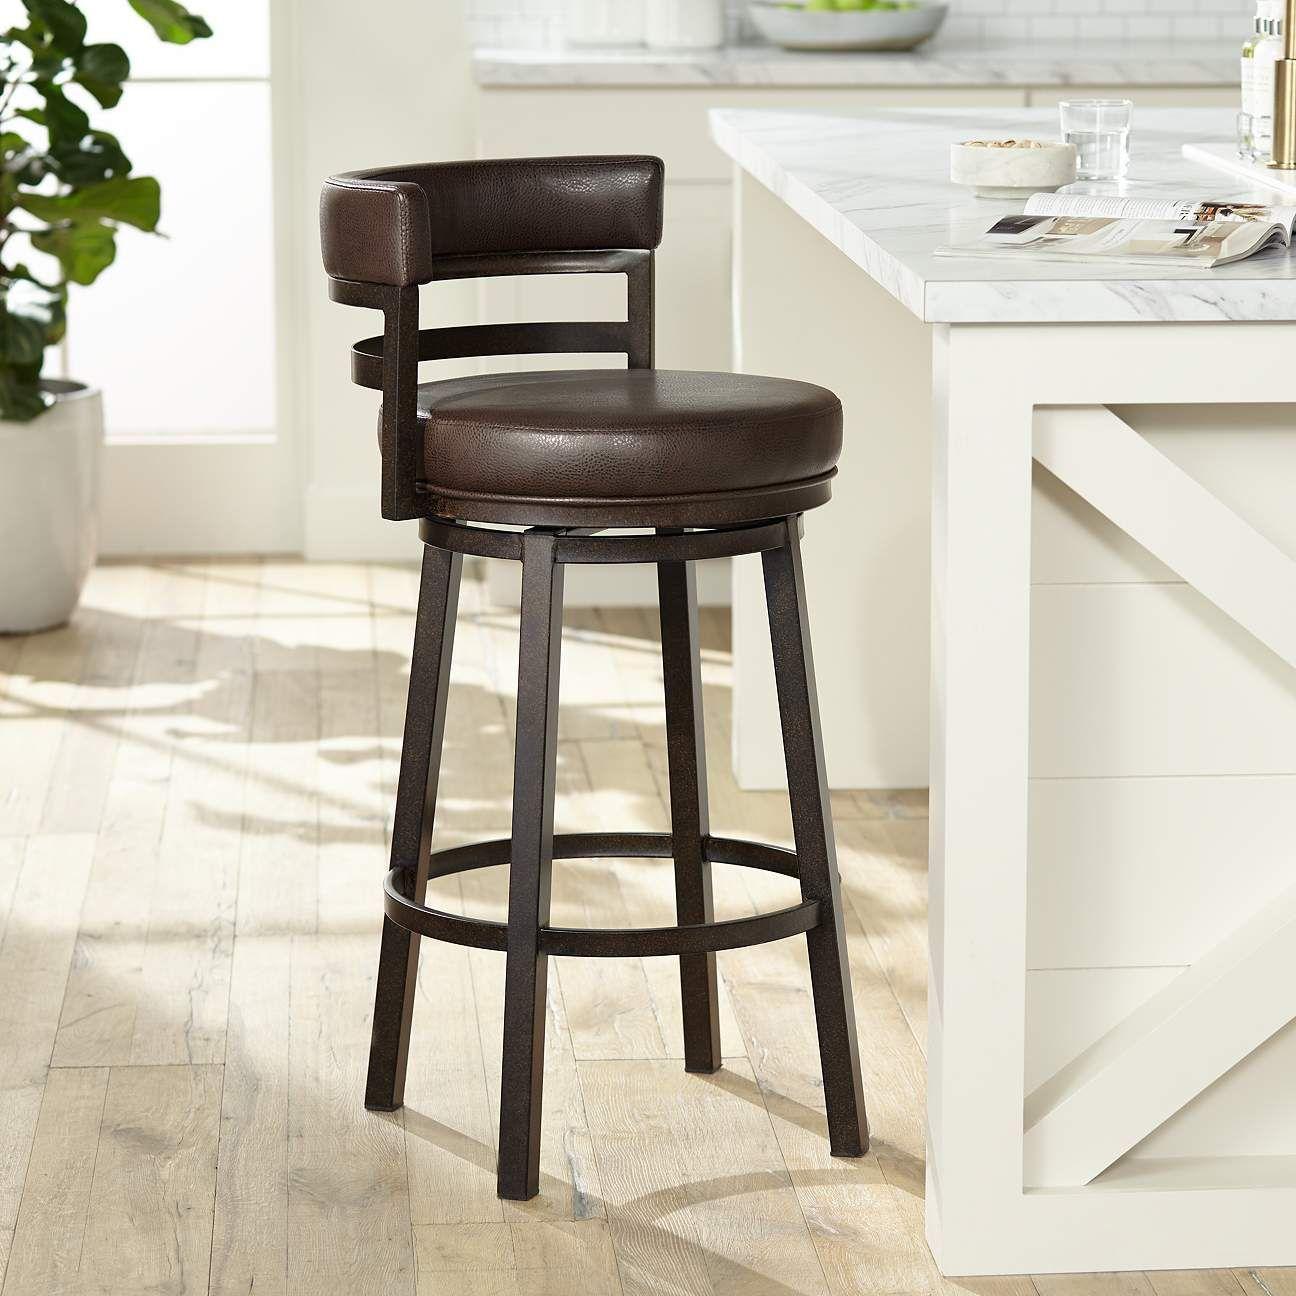 Furniture Remarkable Ideas Of Swivel Bar Stools With Backs Giving Cool Design Swivel Bar Stools With Backs L Ultimas Tendencias Decoracion De Unas Tendencias